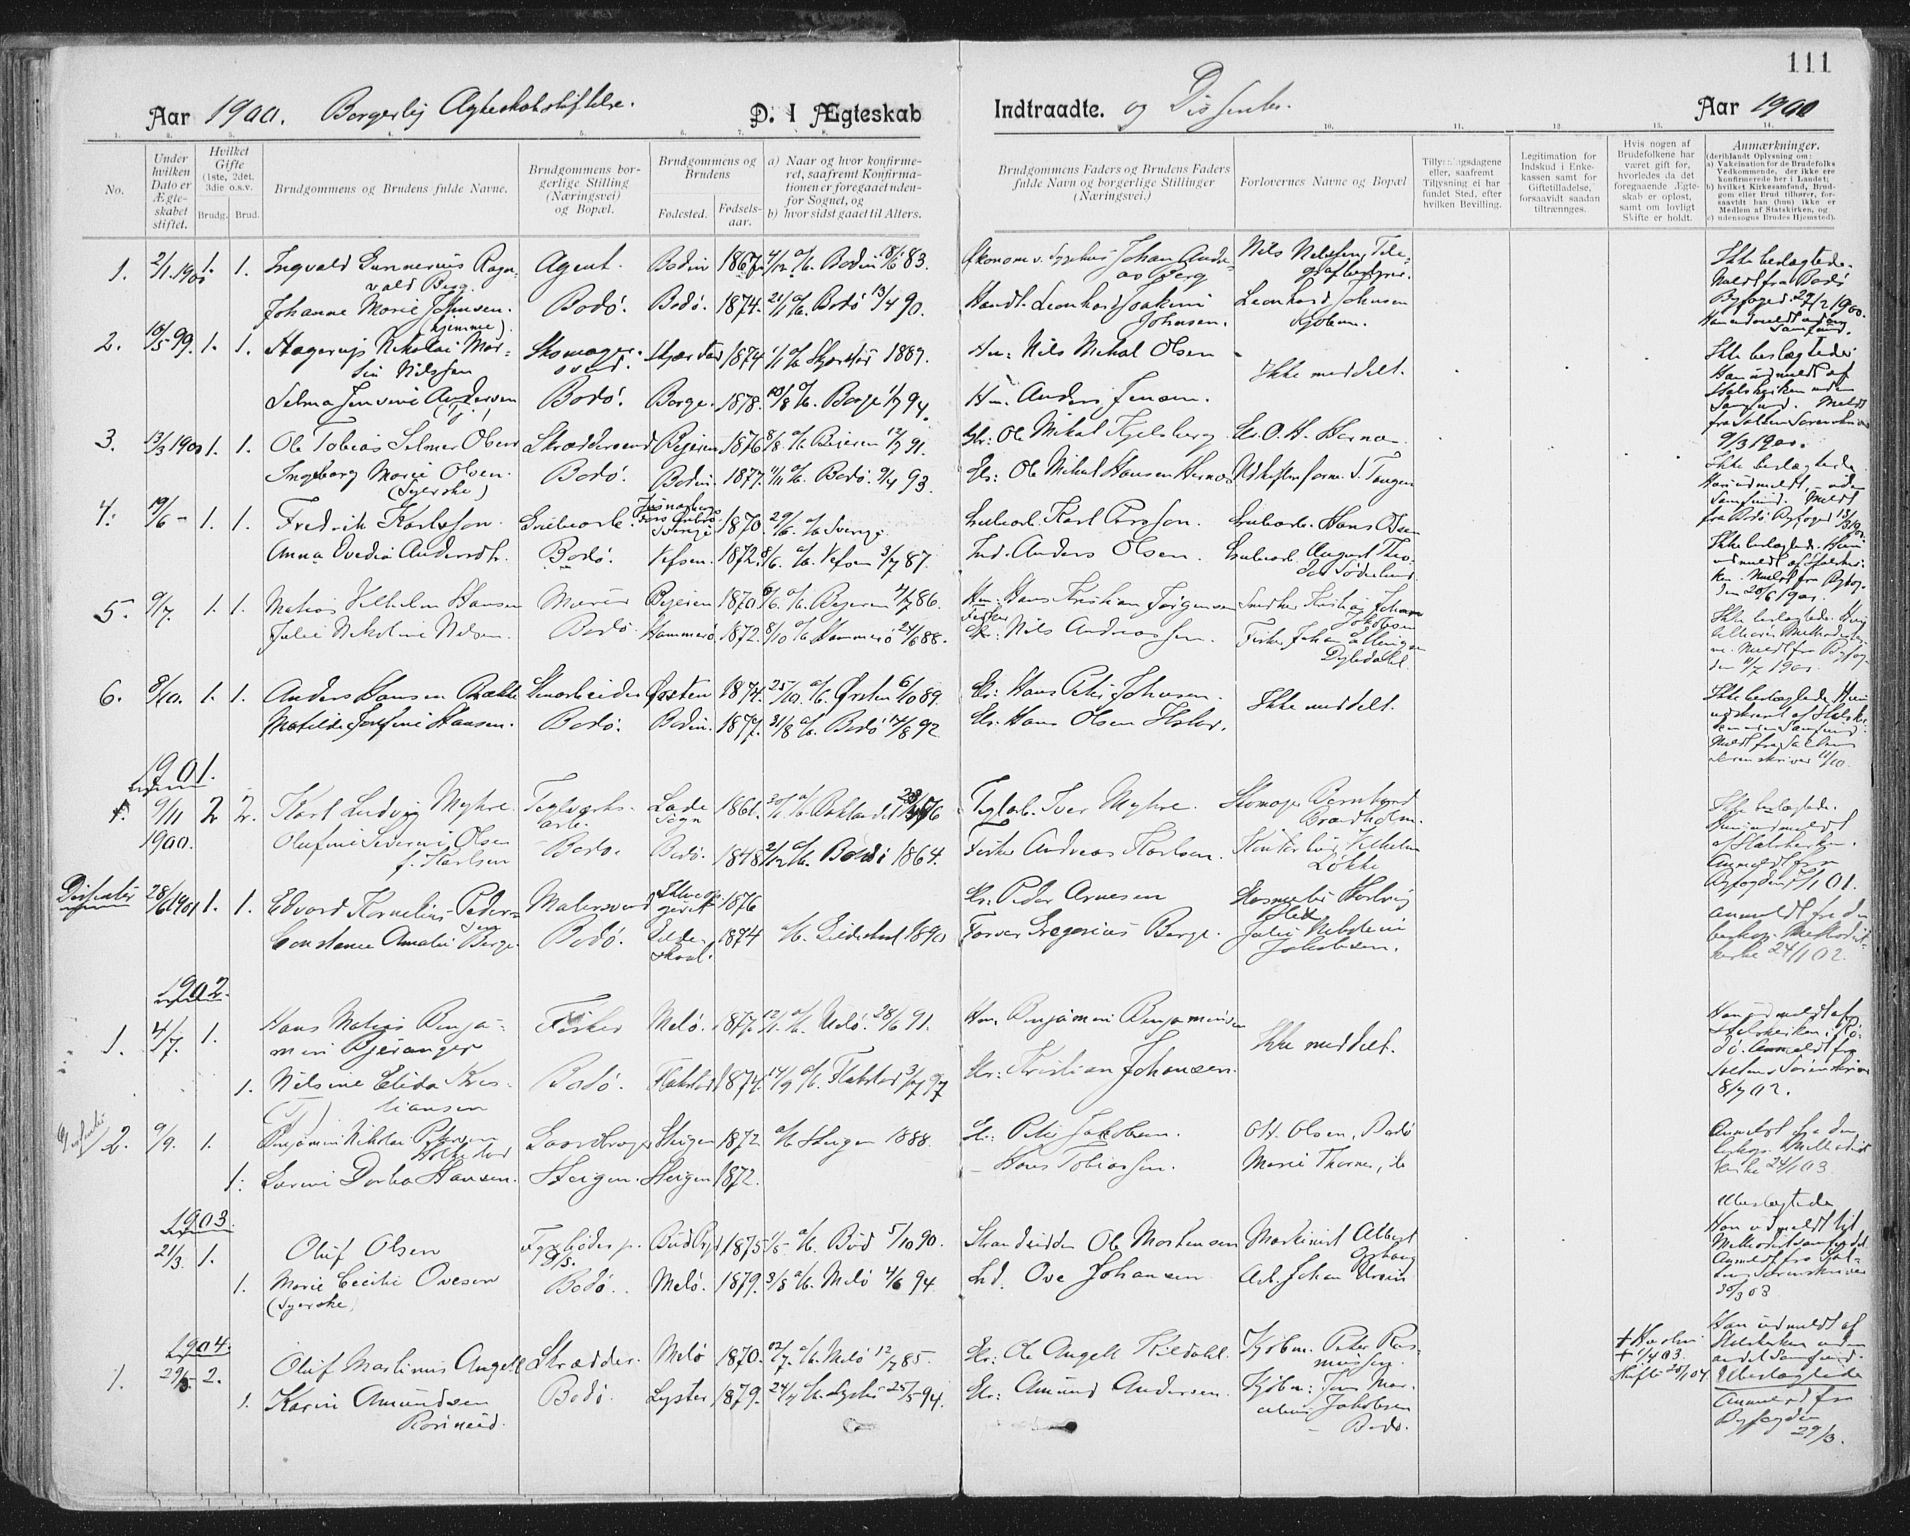 SAT, Ministerialprotokoller, klokkerbøker og fødselsregistre - Nordland, 801/L0012: Ministerialbok nr. 801A12, 1900-1916, s. 111